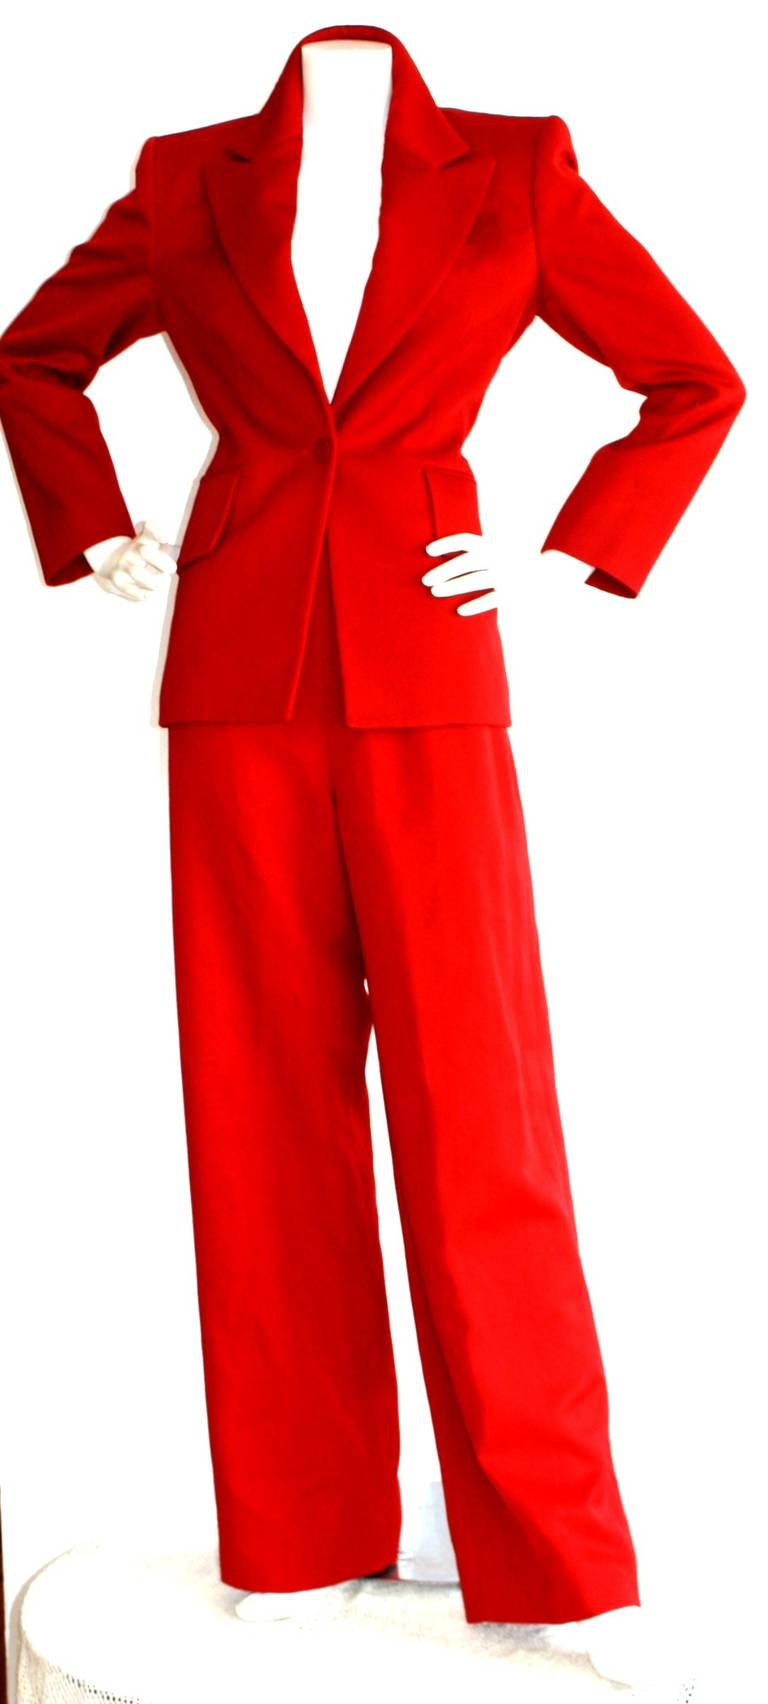 Isaac Mizrahi Vintage Lipstick Red Holiday Le Smoking Suit 2